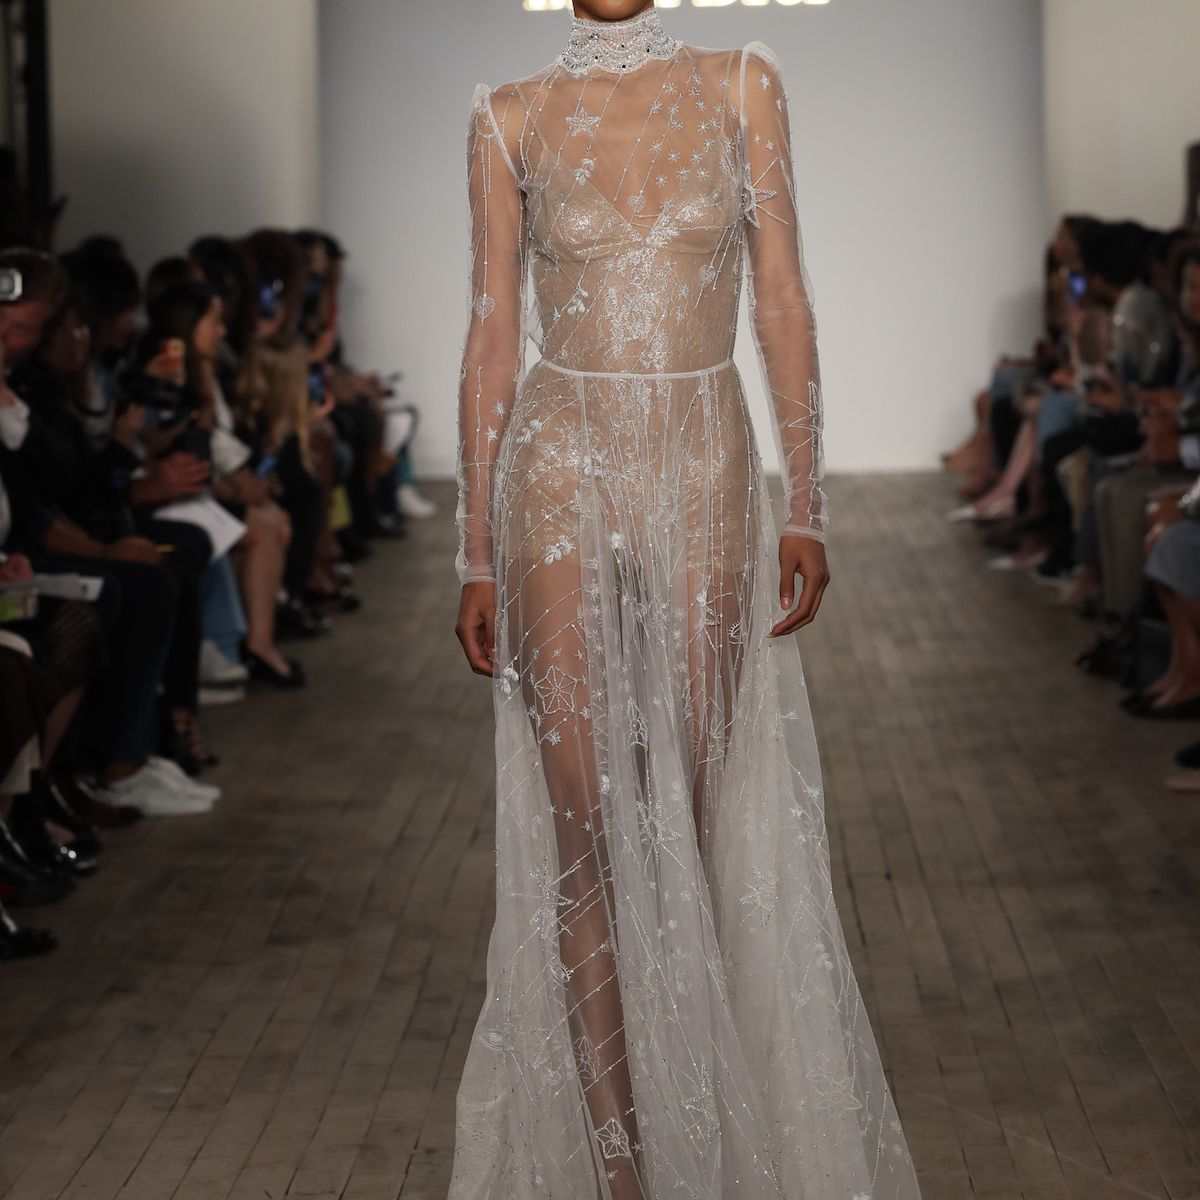 Model in long sleeve high-neck wedding dress